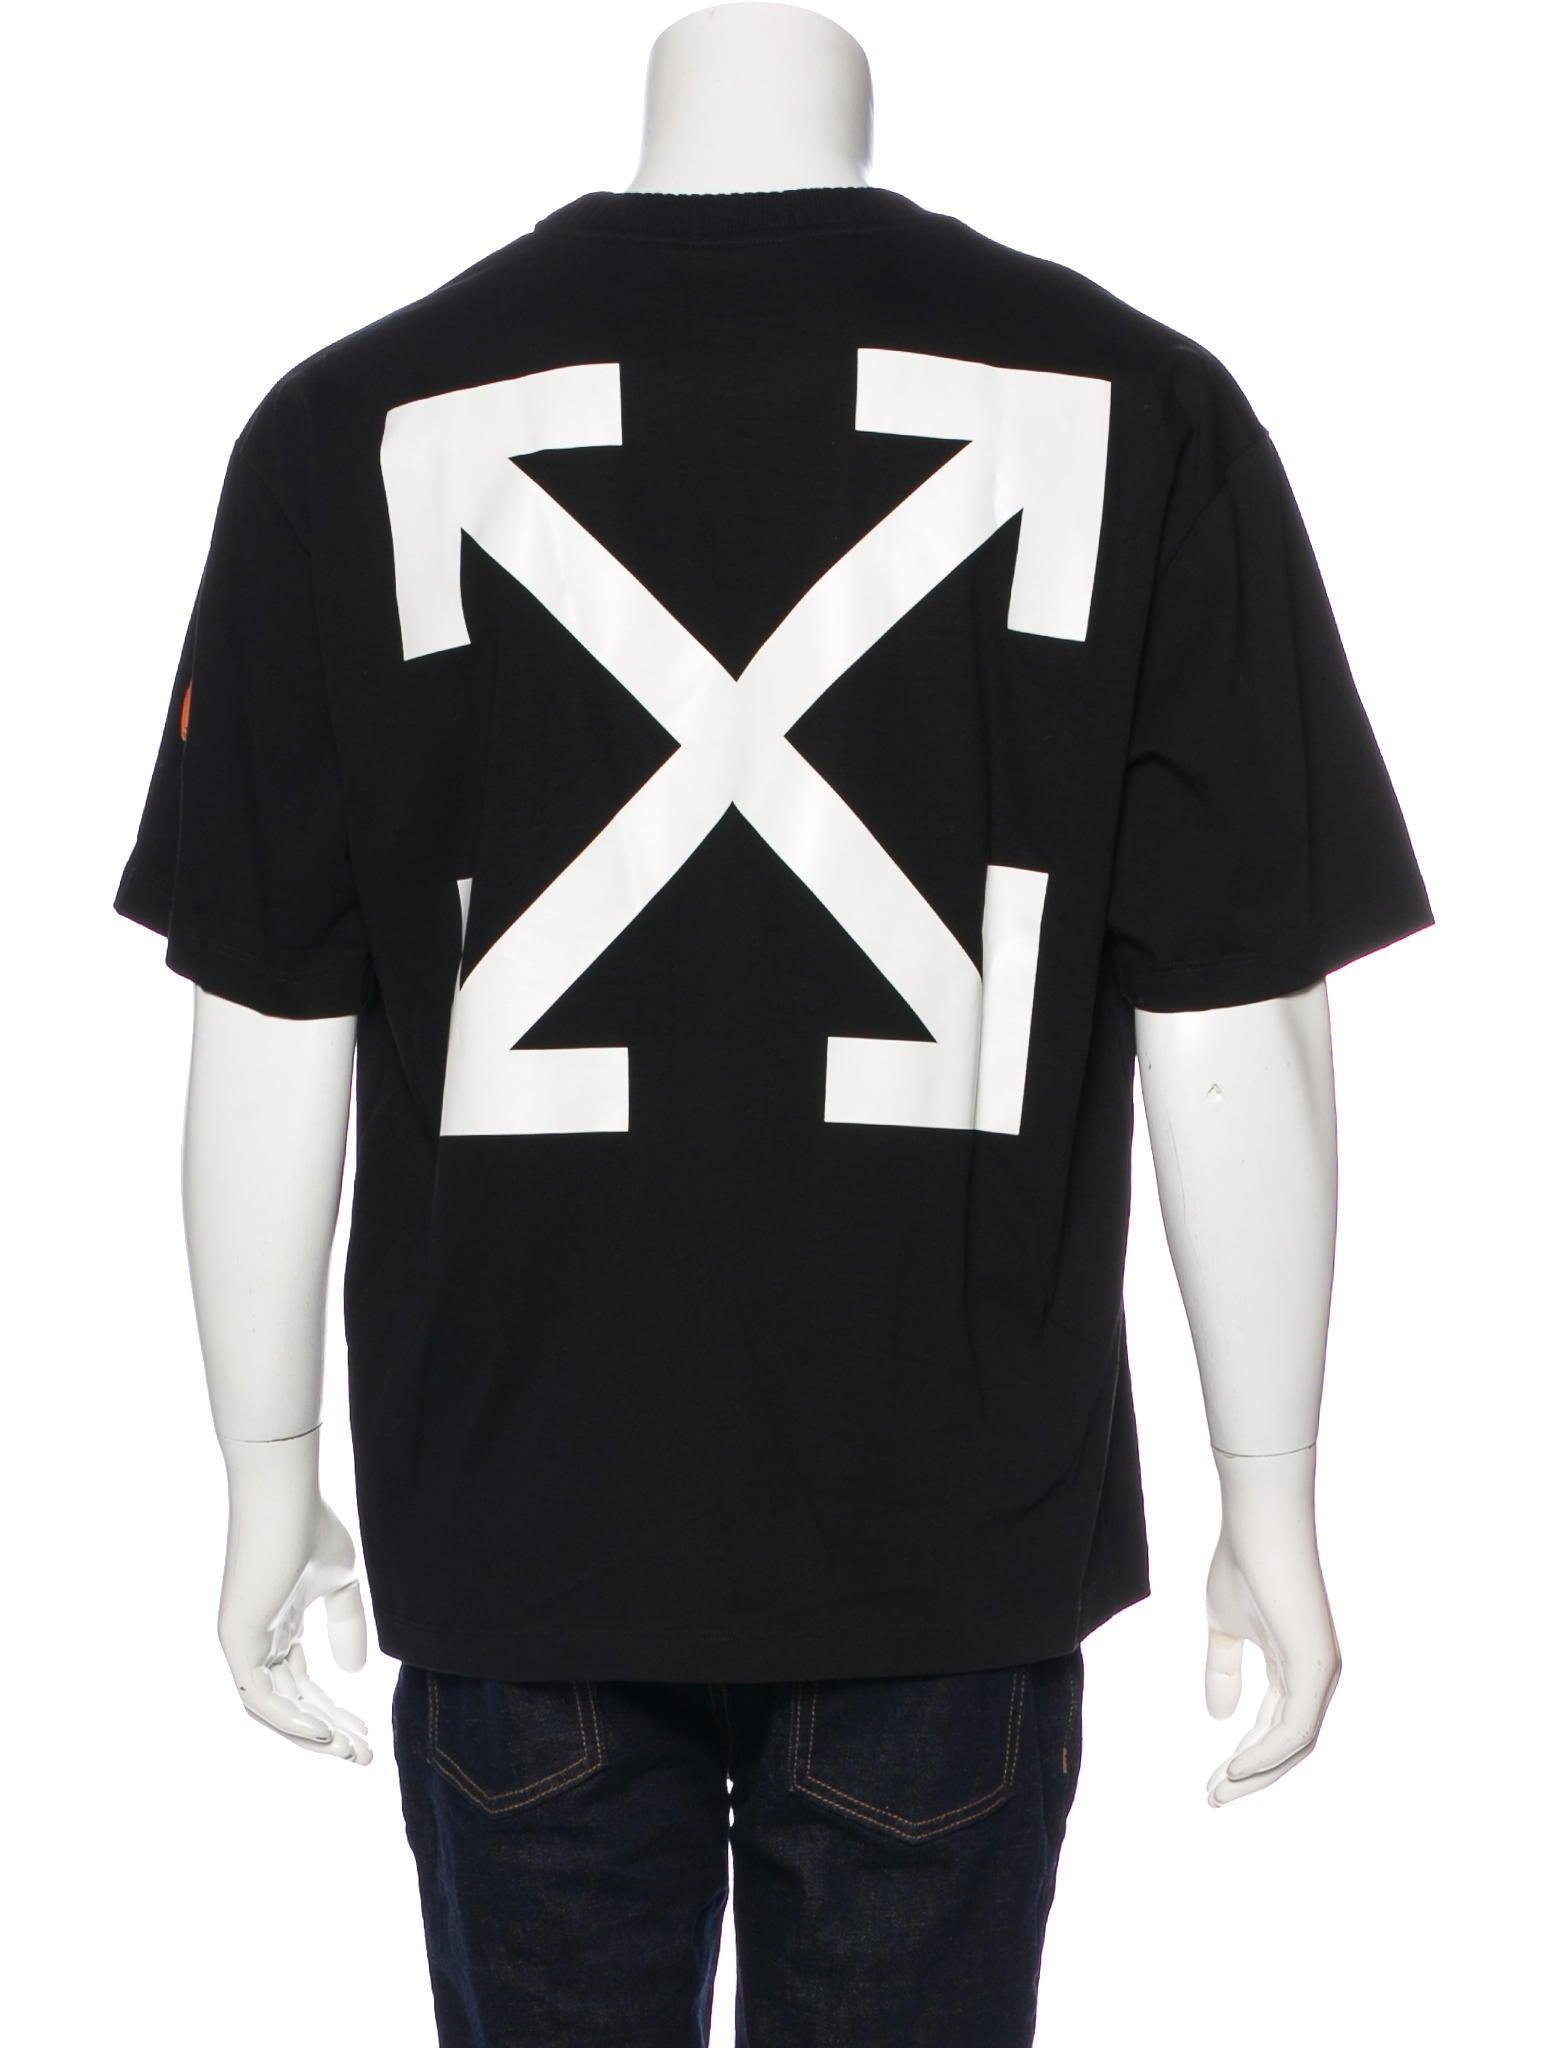 Off white x moncler black swan t shirt clothing for Off white moncler t shirt